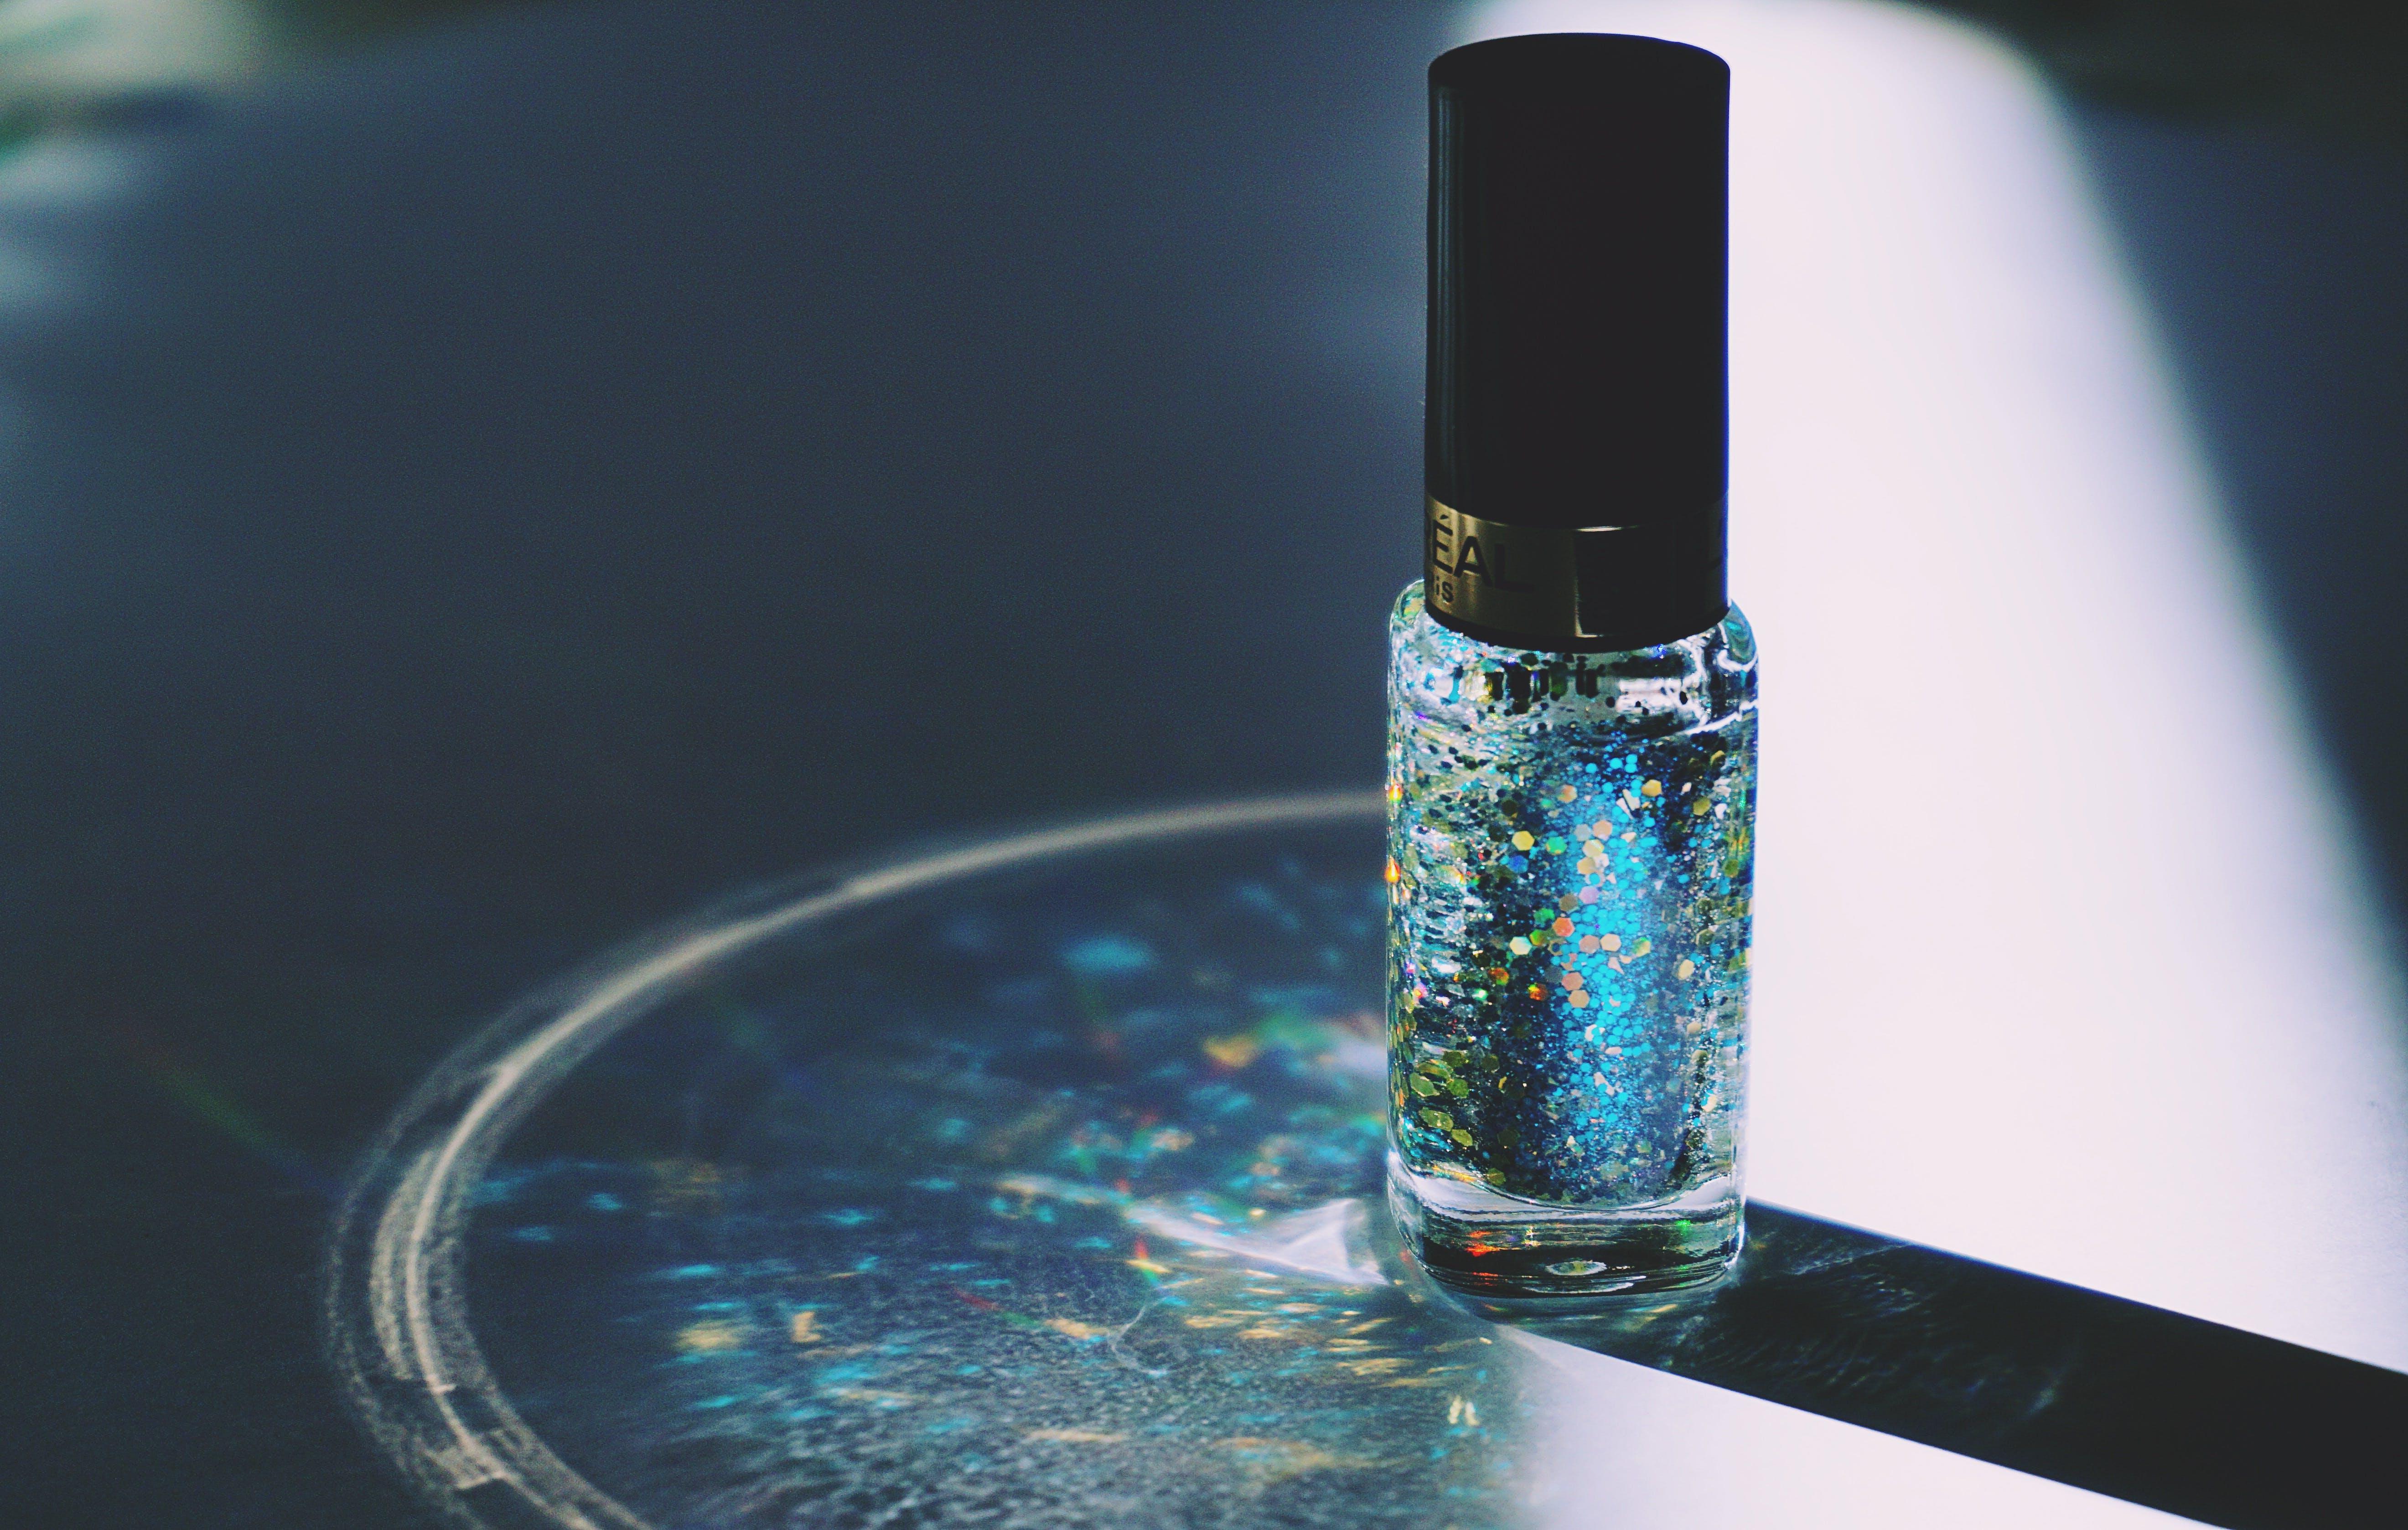 Closed Blue Glitter Nail Polish Bottle